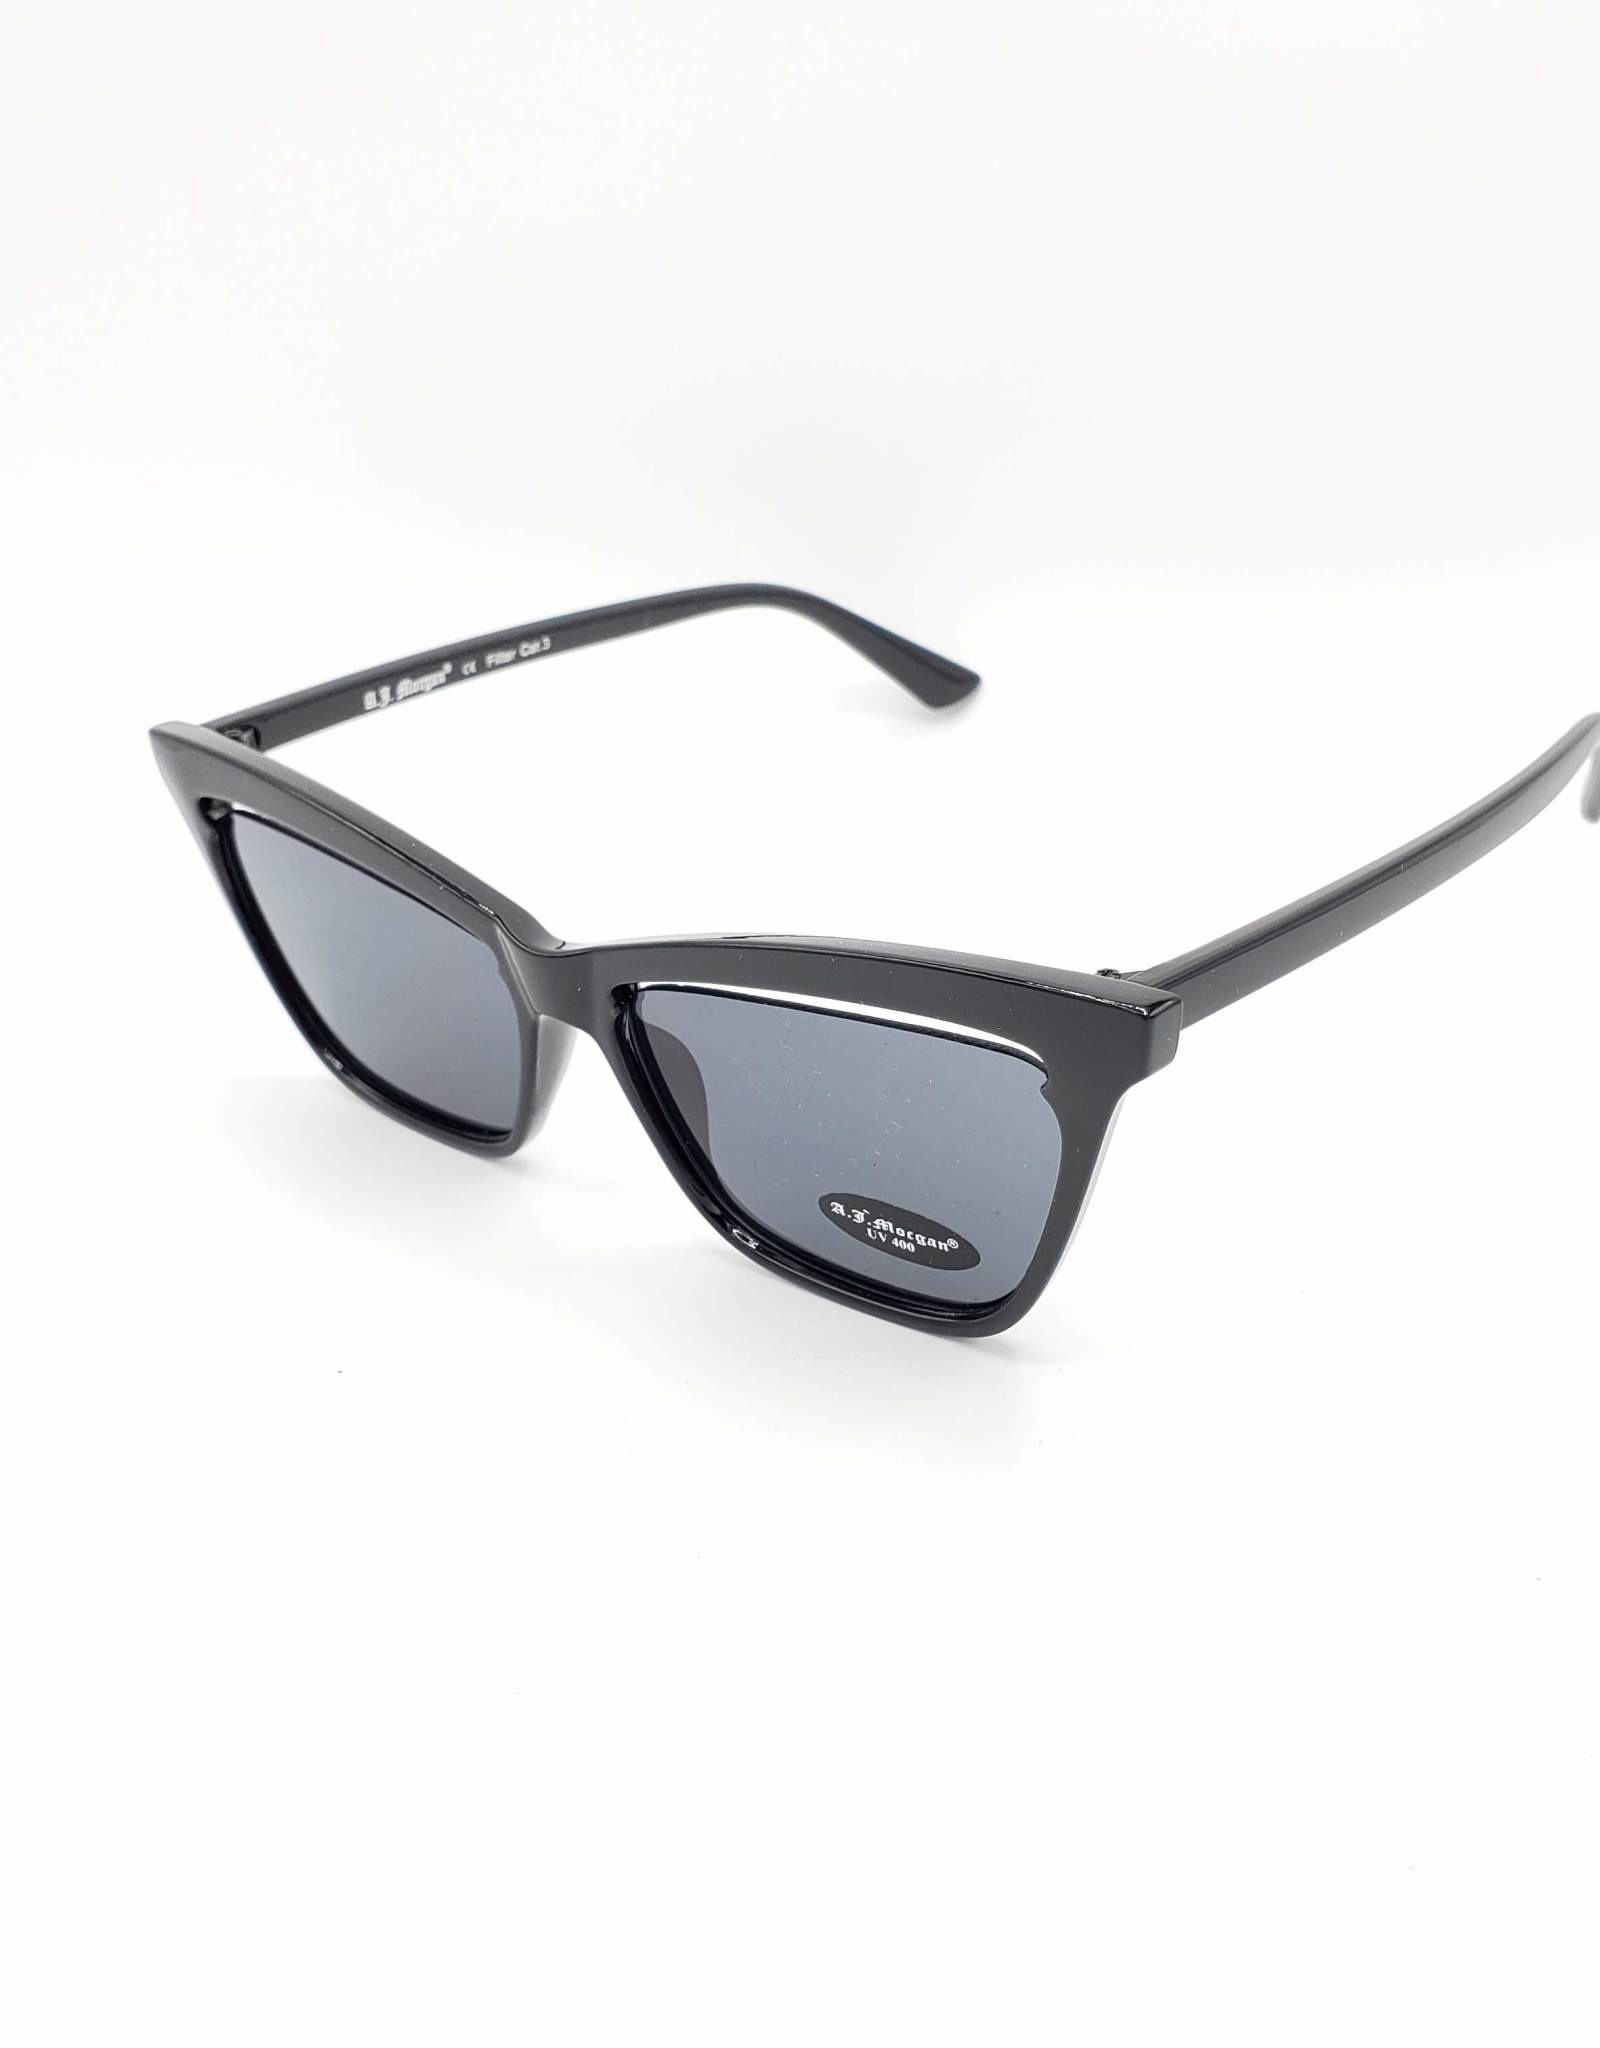 AJ Morgan Tippy Black Sunglasses, AJ Morgan